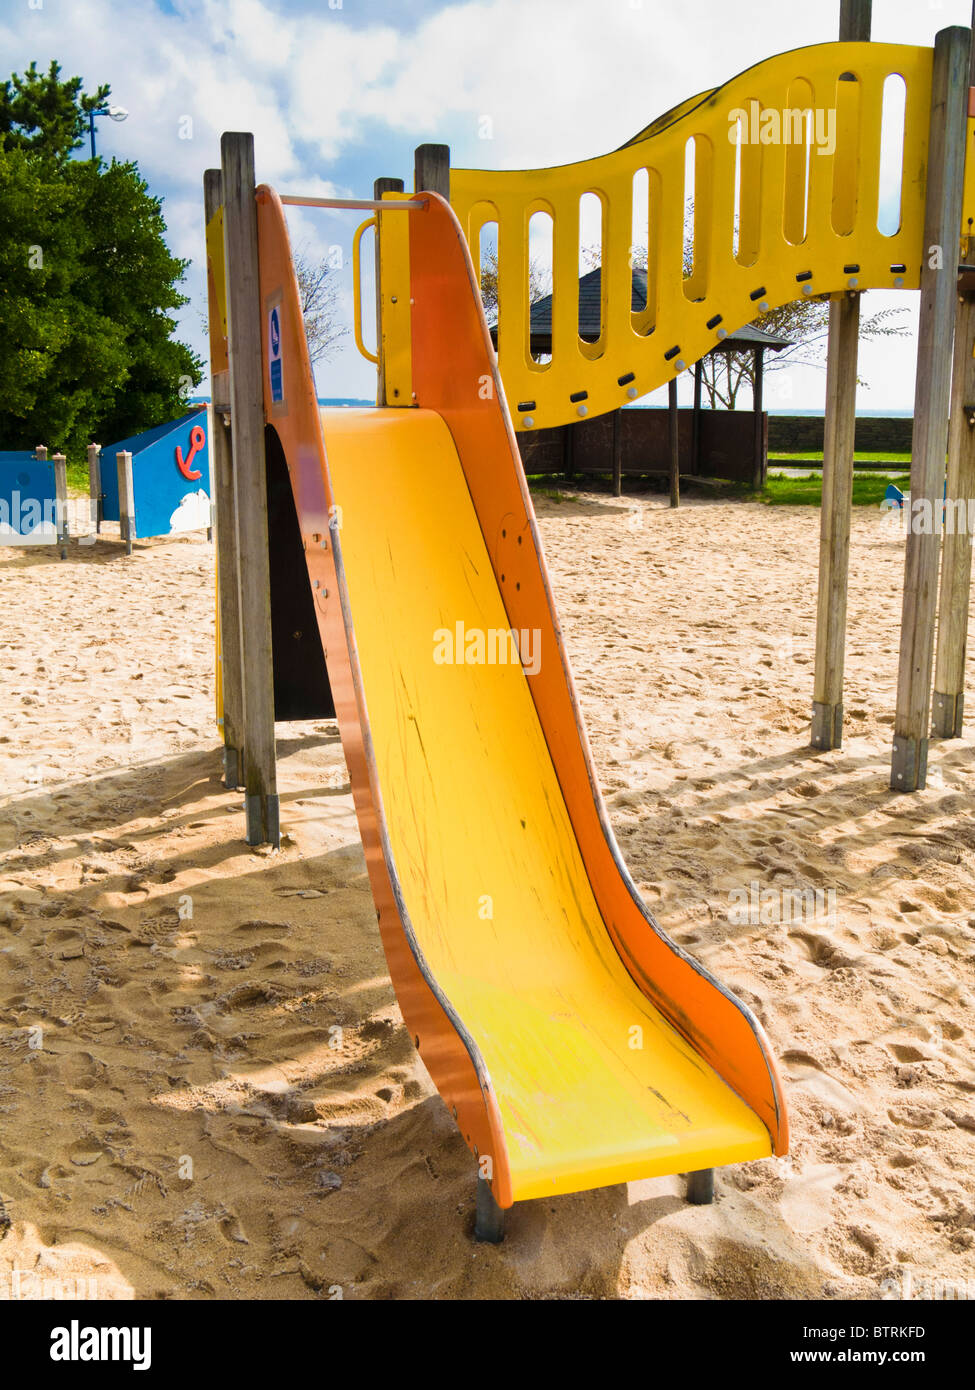 Diapositiva de playground para niños Imagen De Stock